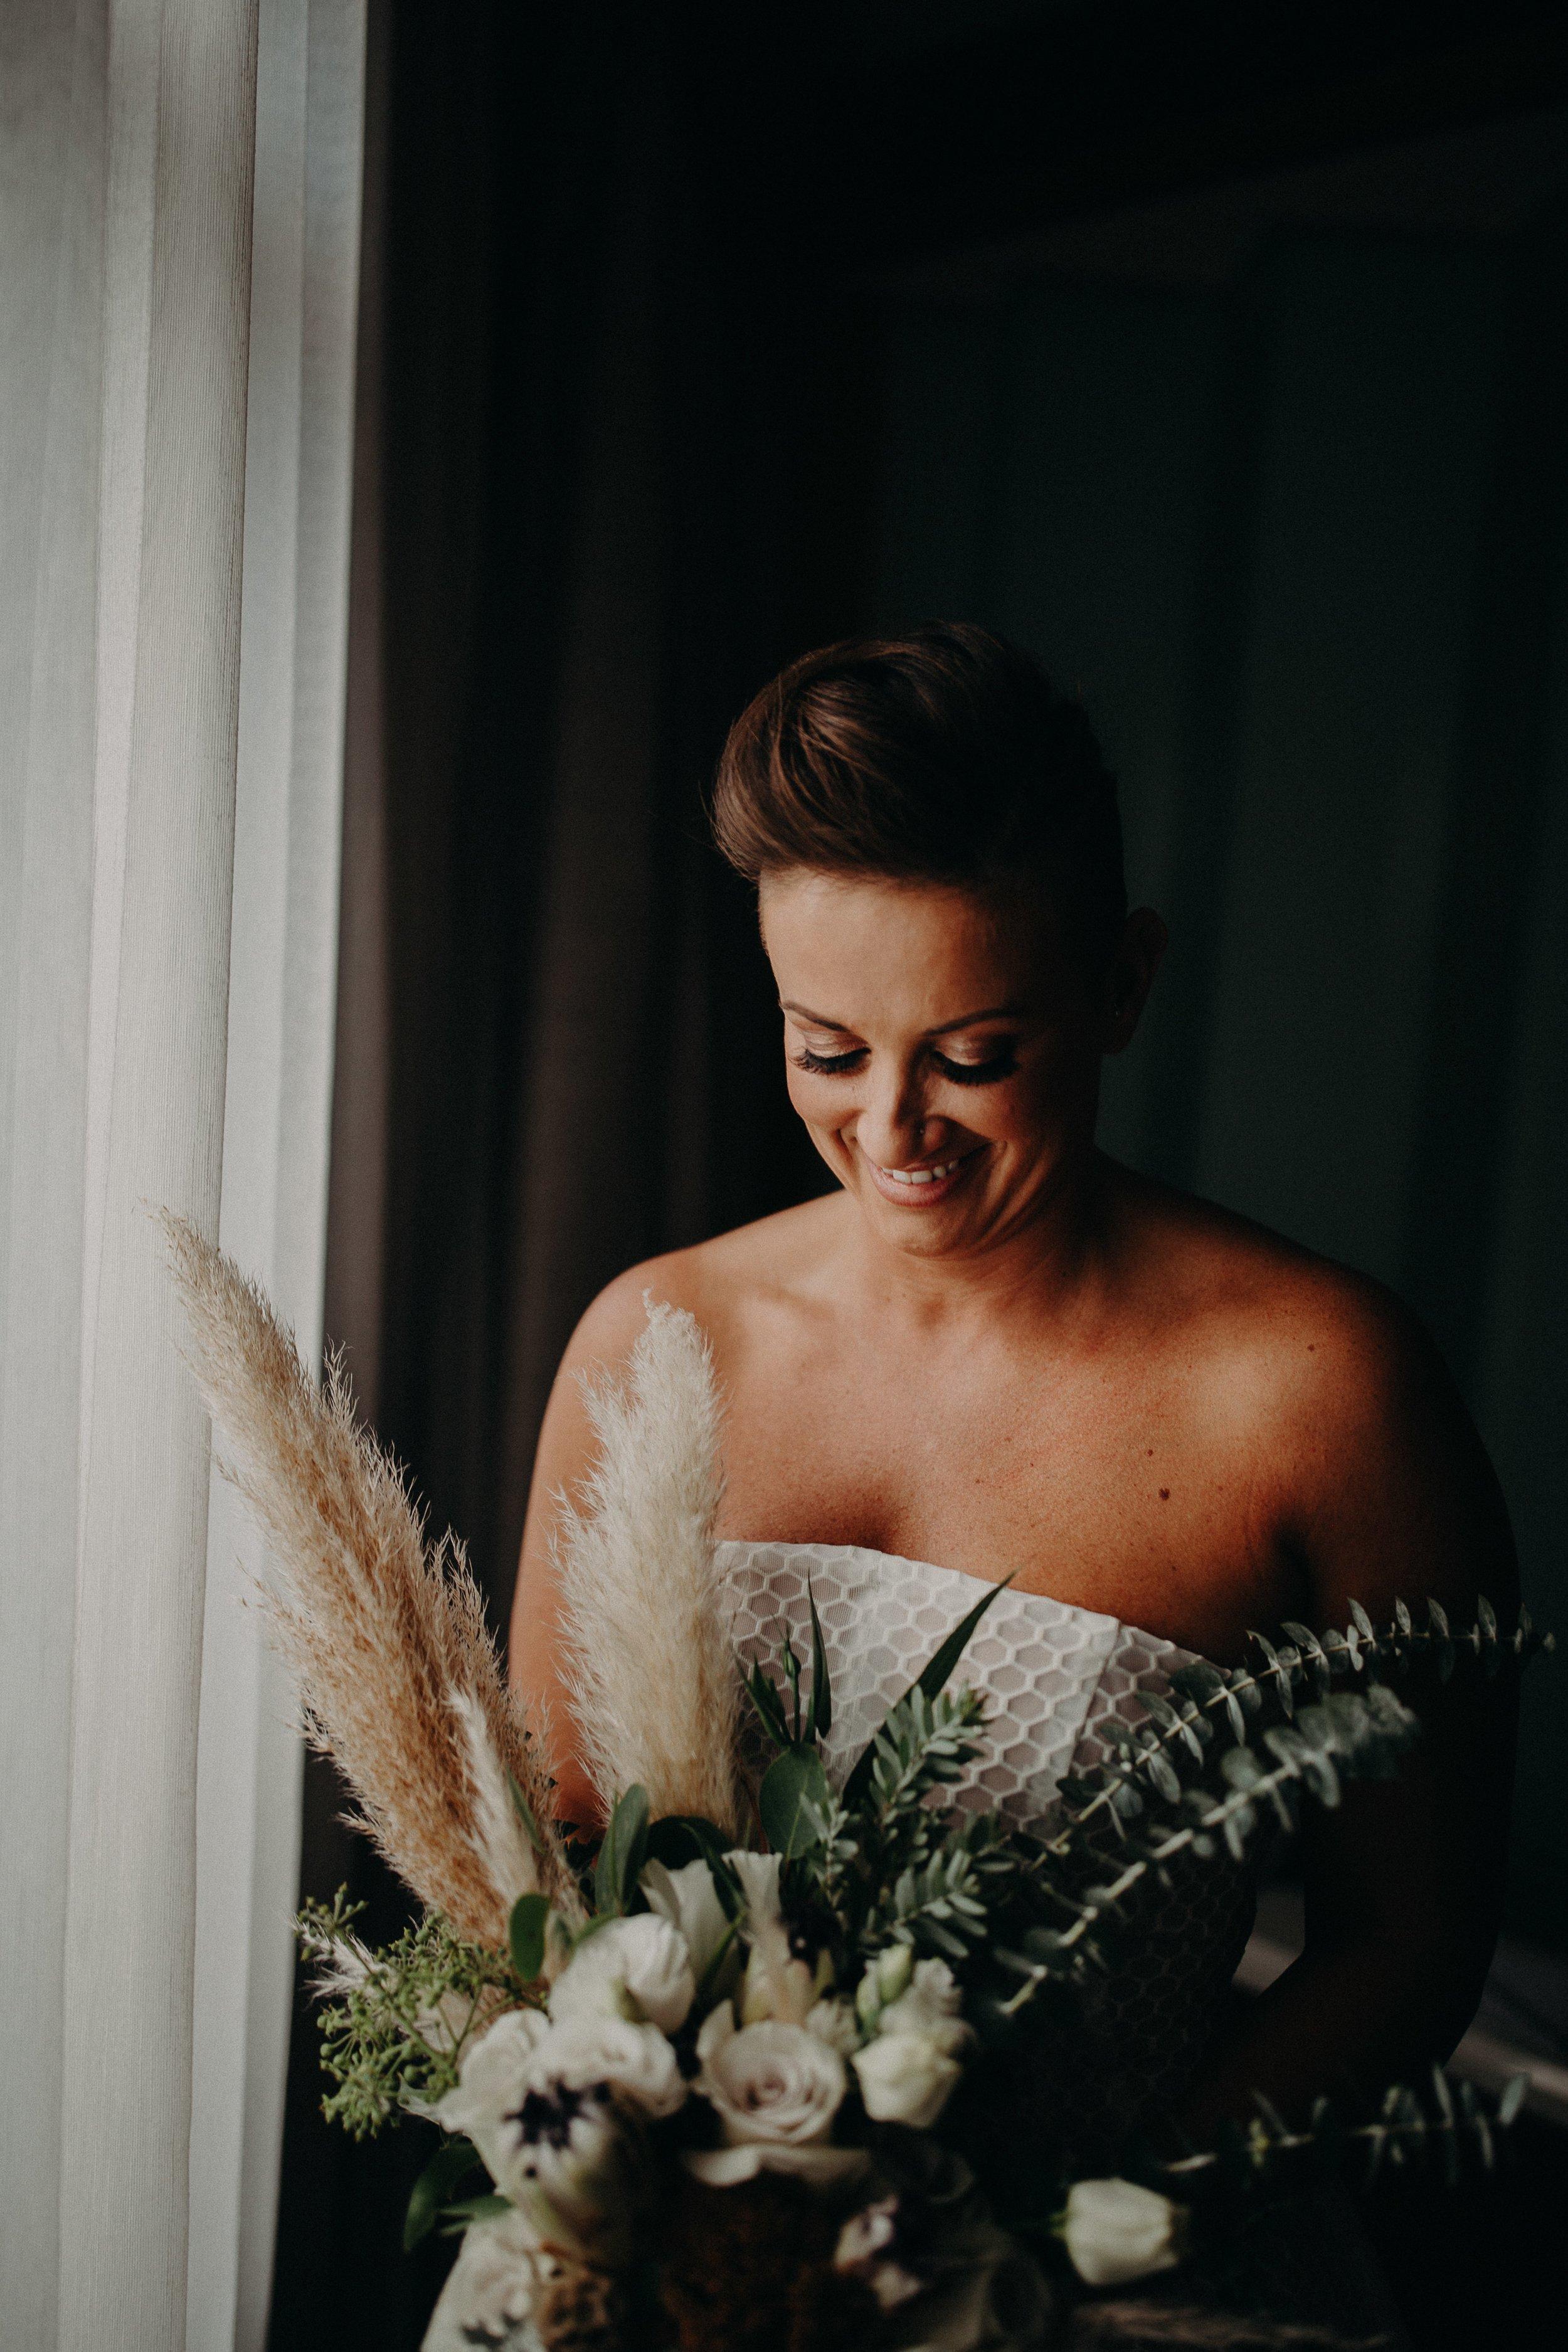 mickalathomas_puremacphotography_weddingphotographer_couplephotographer_Sheppartonphotographer_1525.jpg